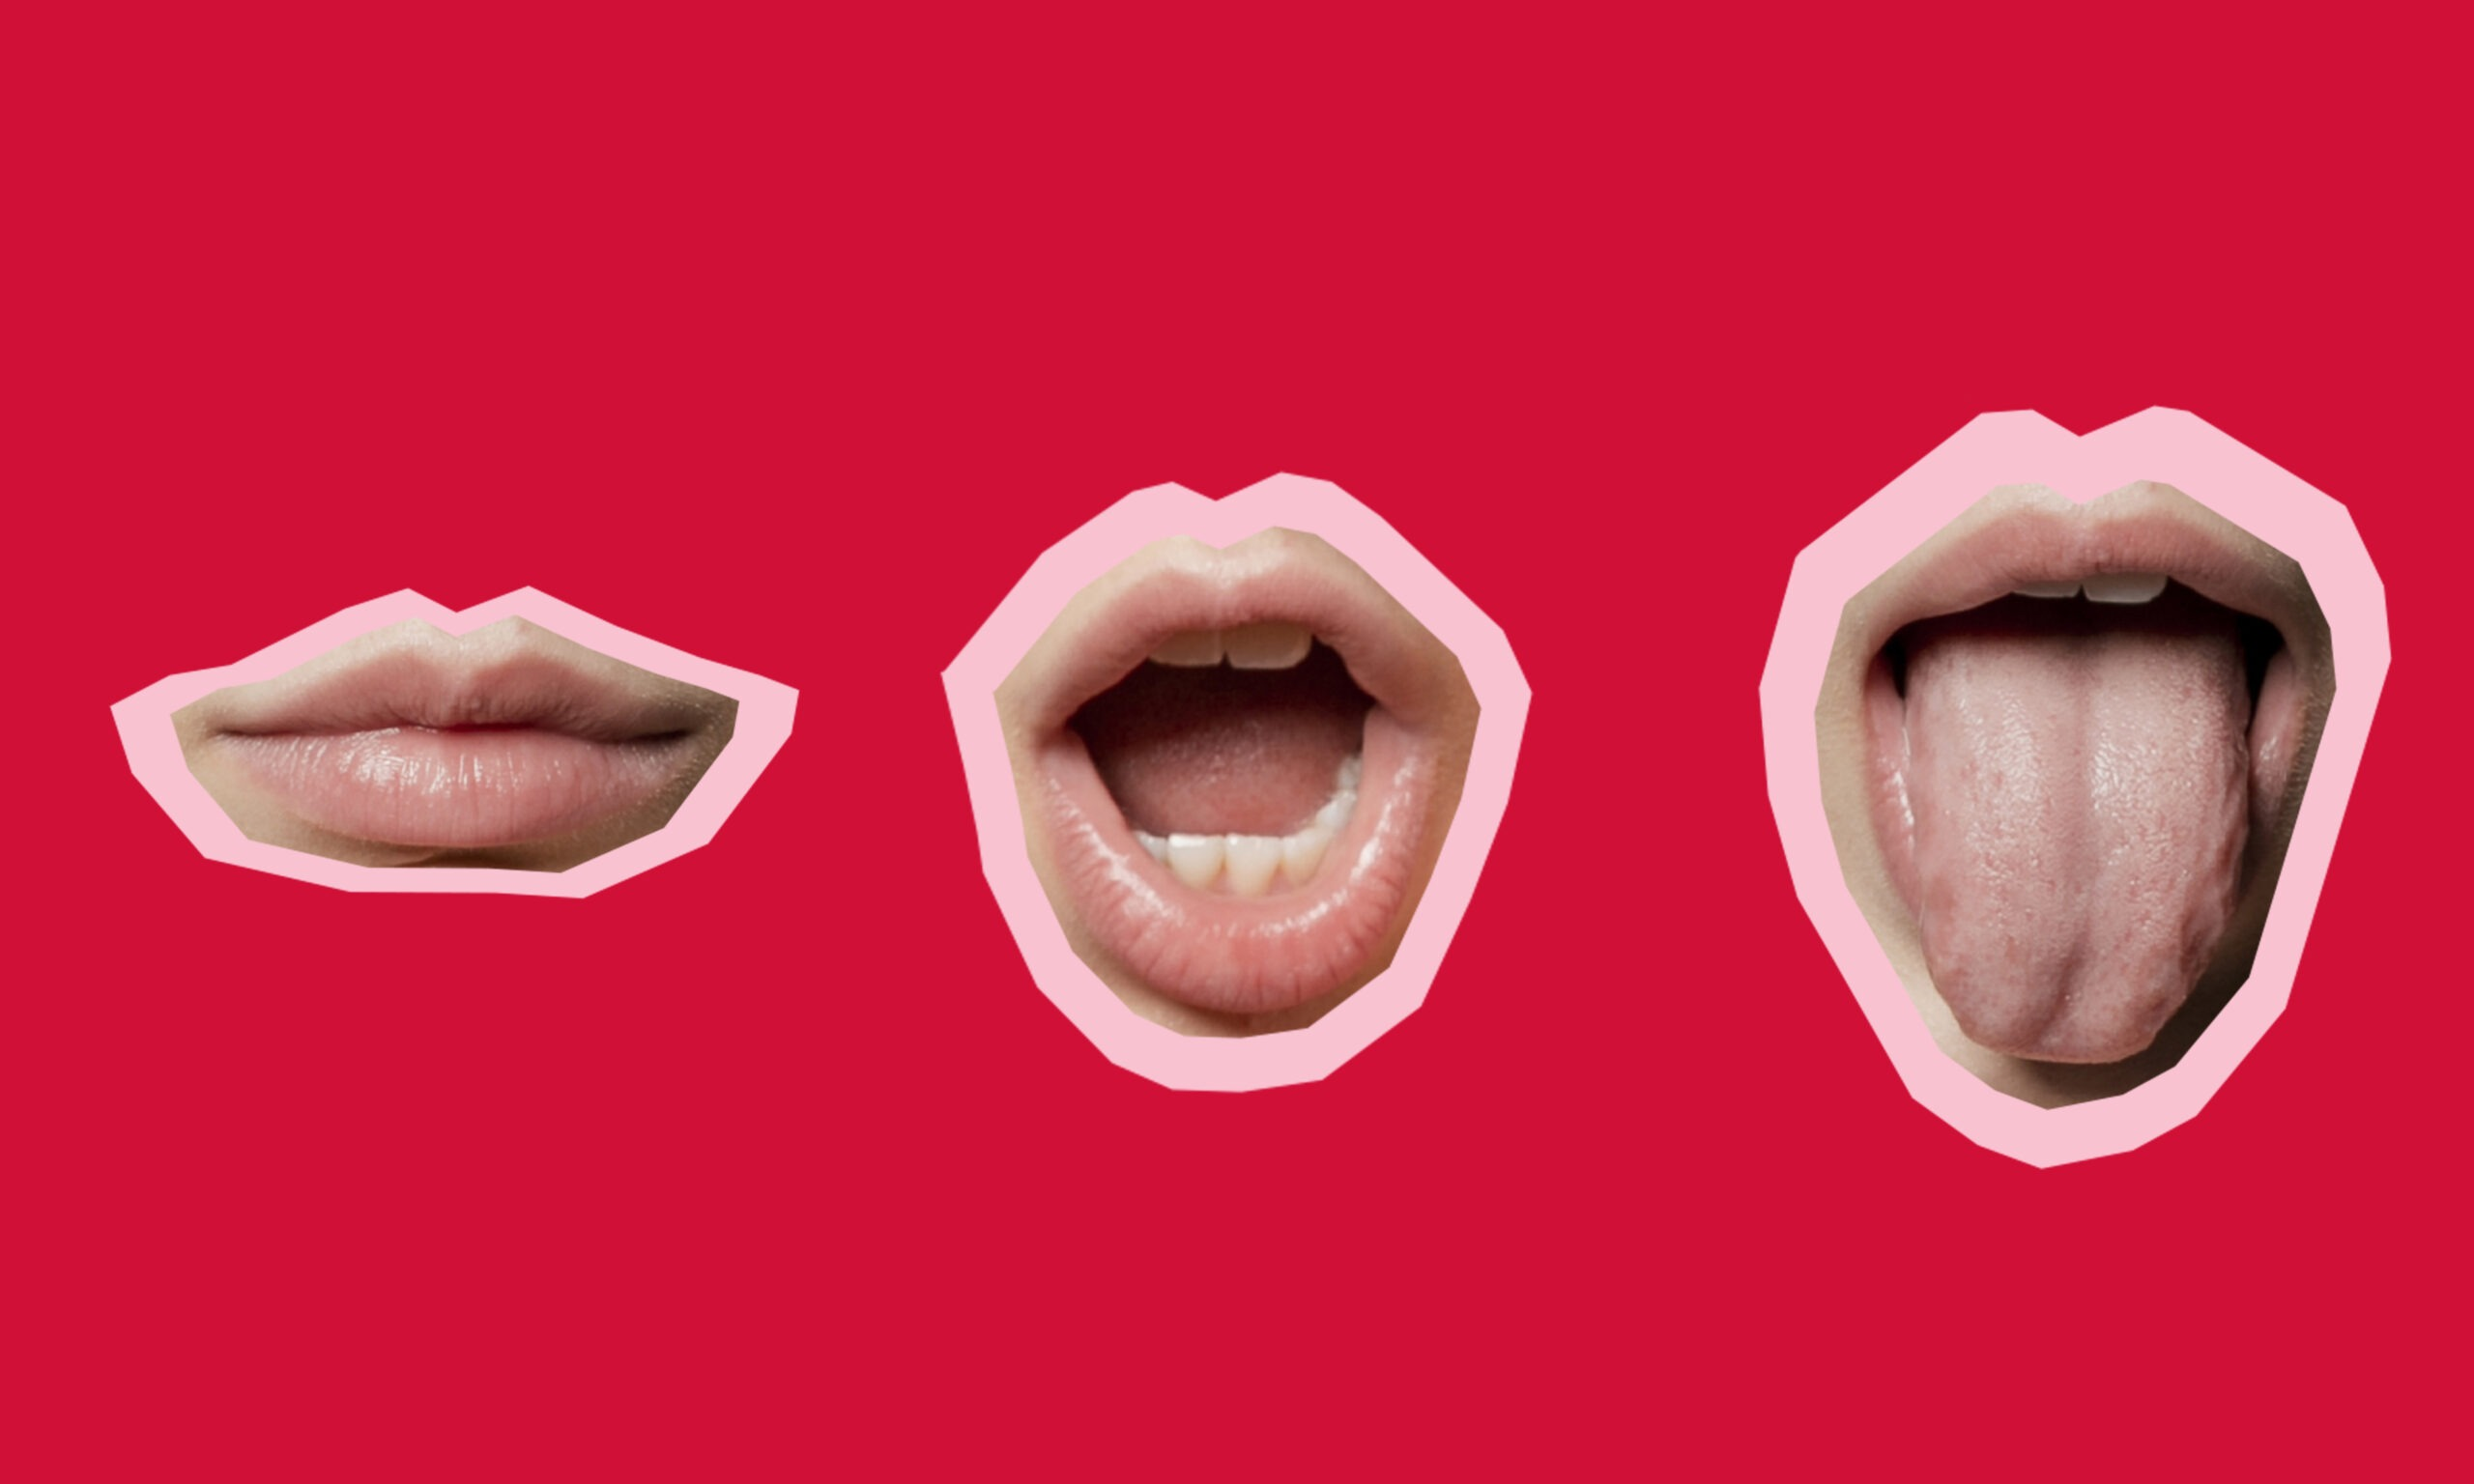 água oxigenada na boca